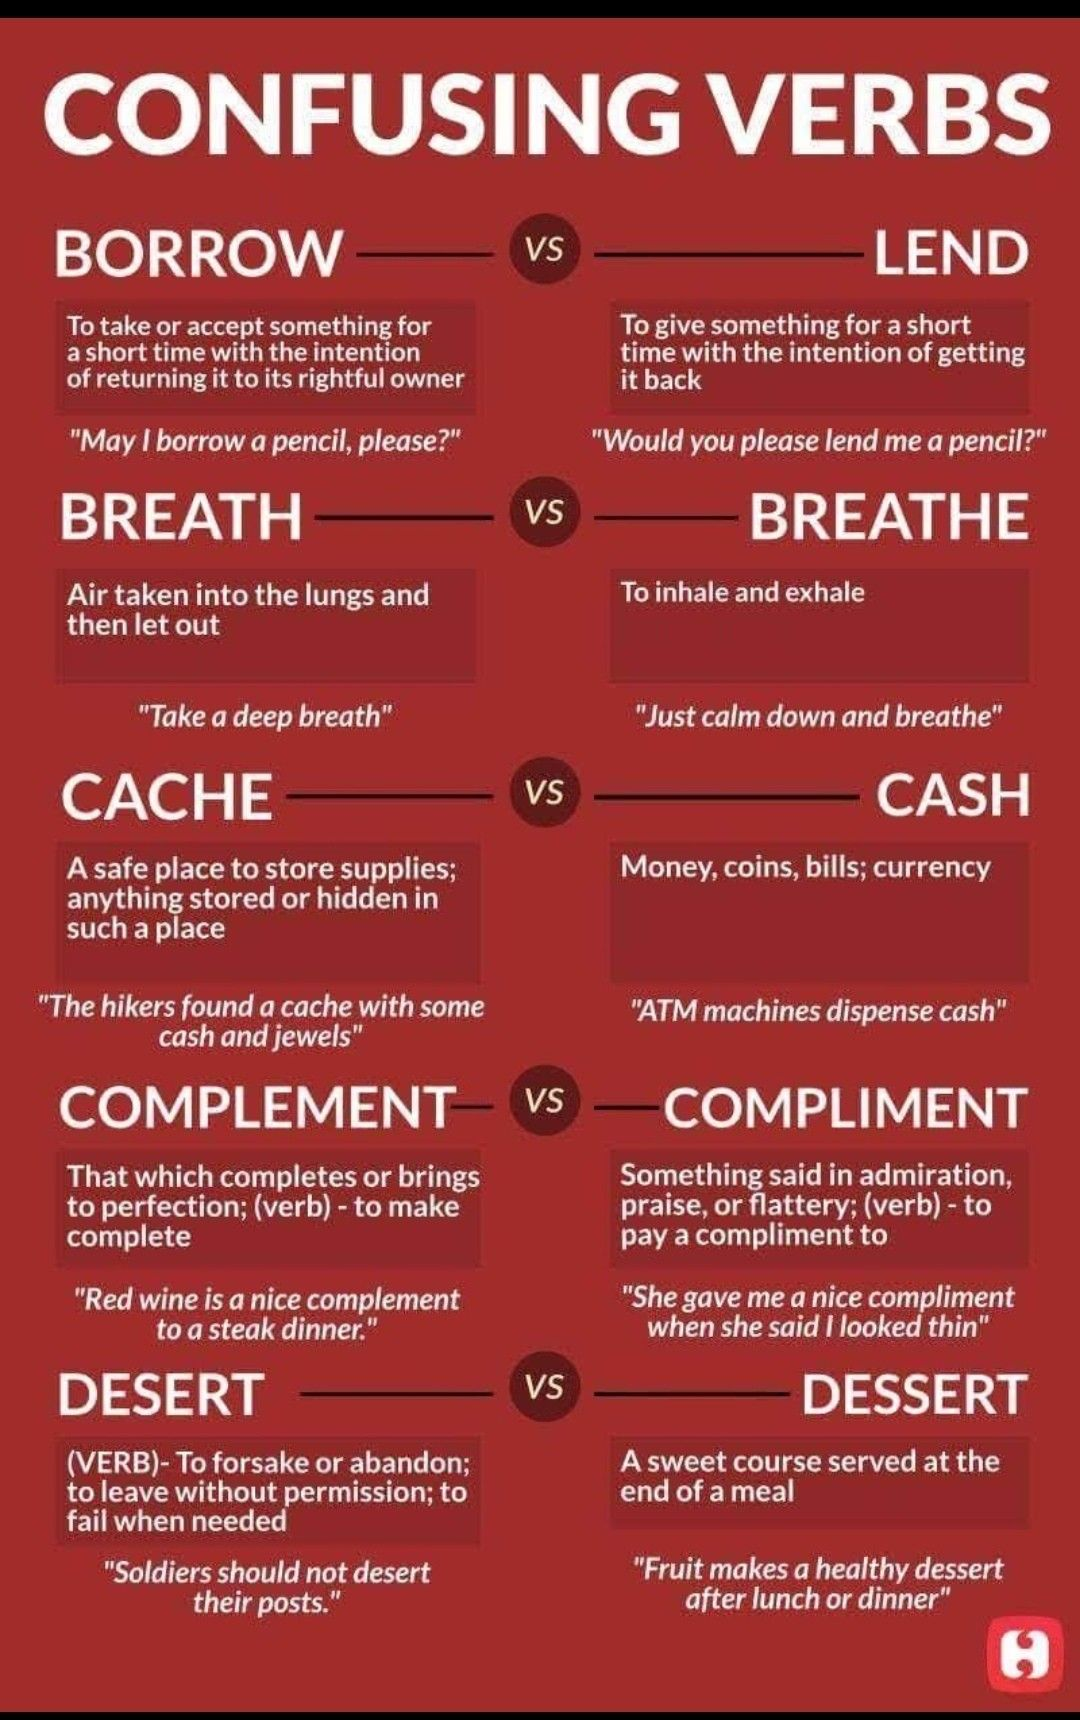 We Love Grammar The3rdimage Desiremore English Language Grammar Rules Laws Literature Learn English Grammar Learn English Vocabulary English Phrases